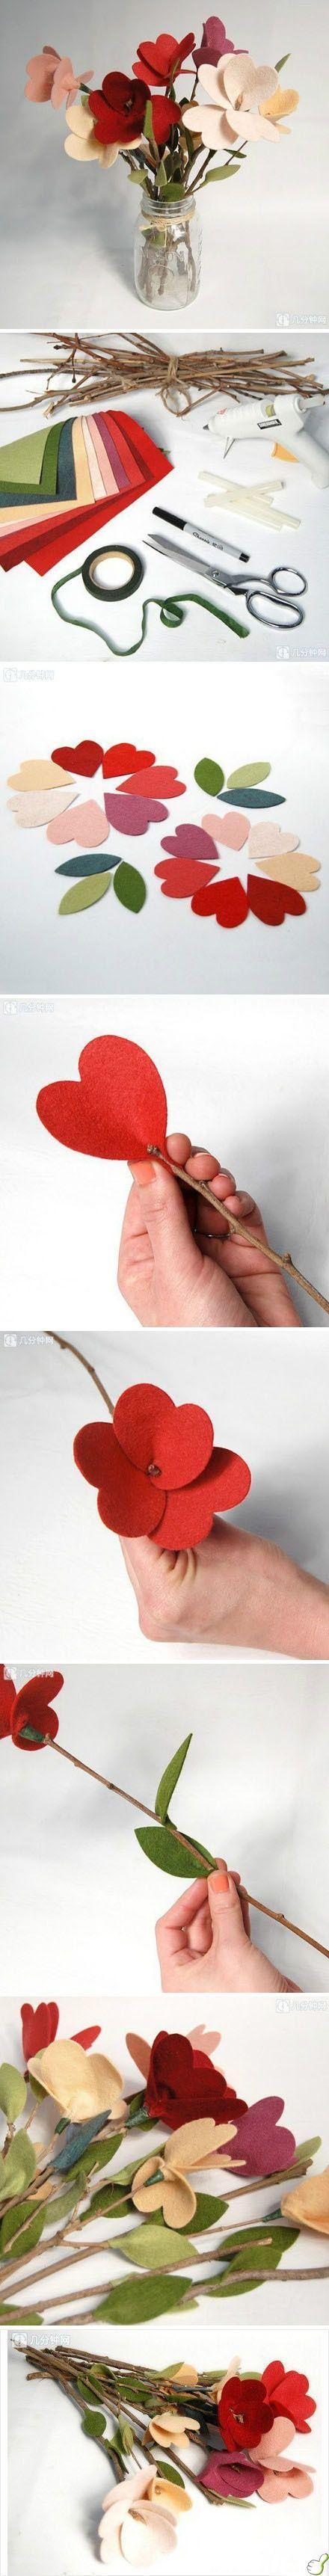 Tutorial para aprender a hacer un ramo de flores de fieltro con ramas de árboles